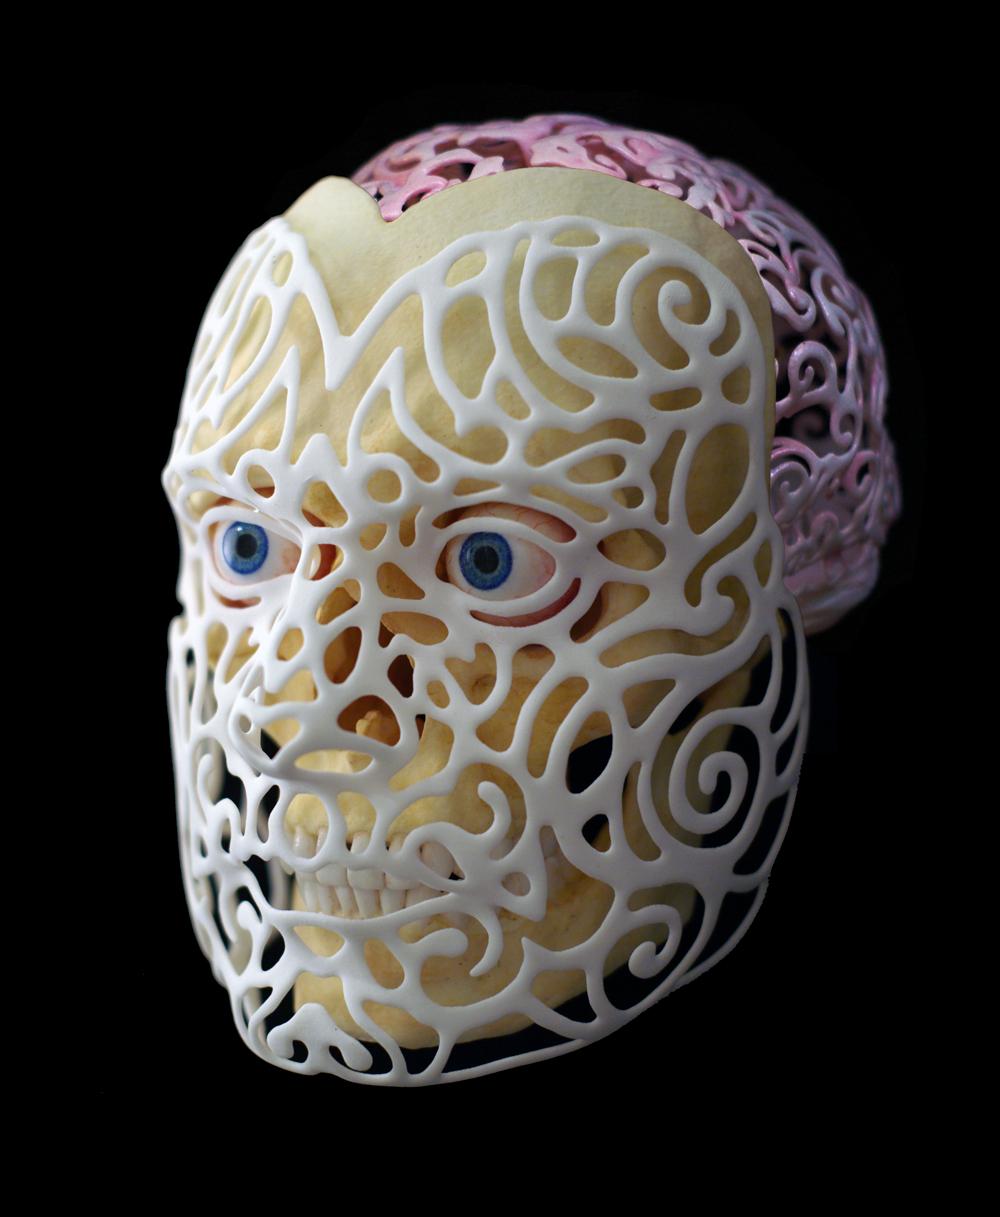 Anatomical 3D Self-Portrait by Joshua Harker